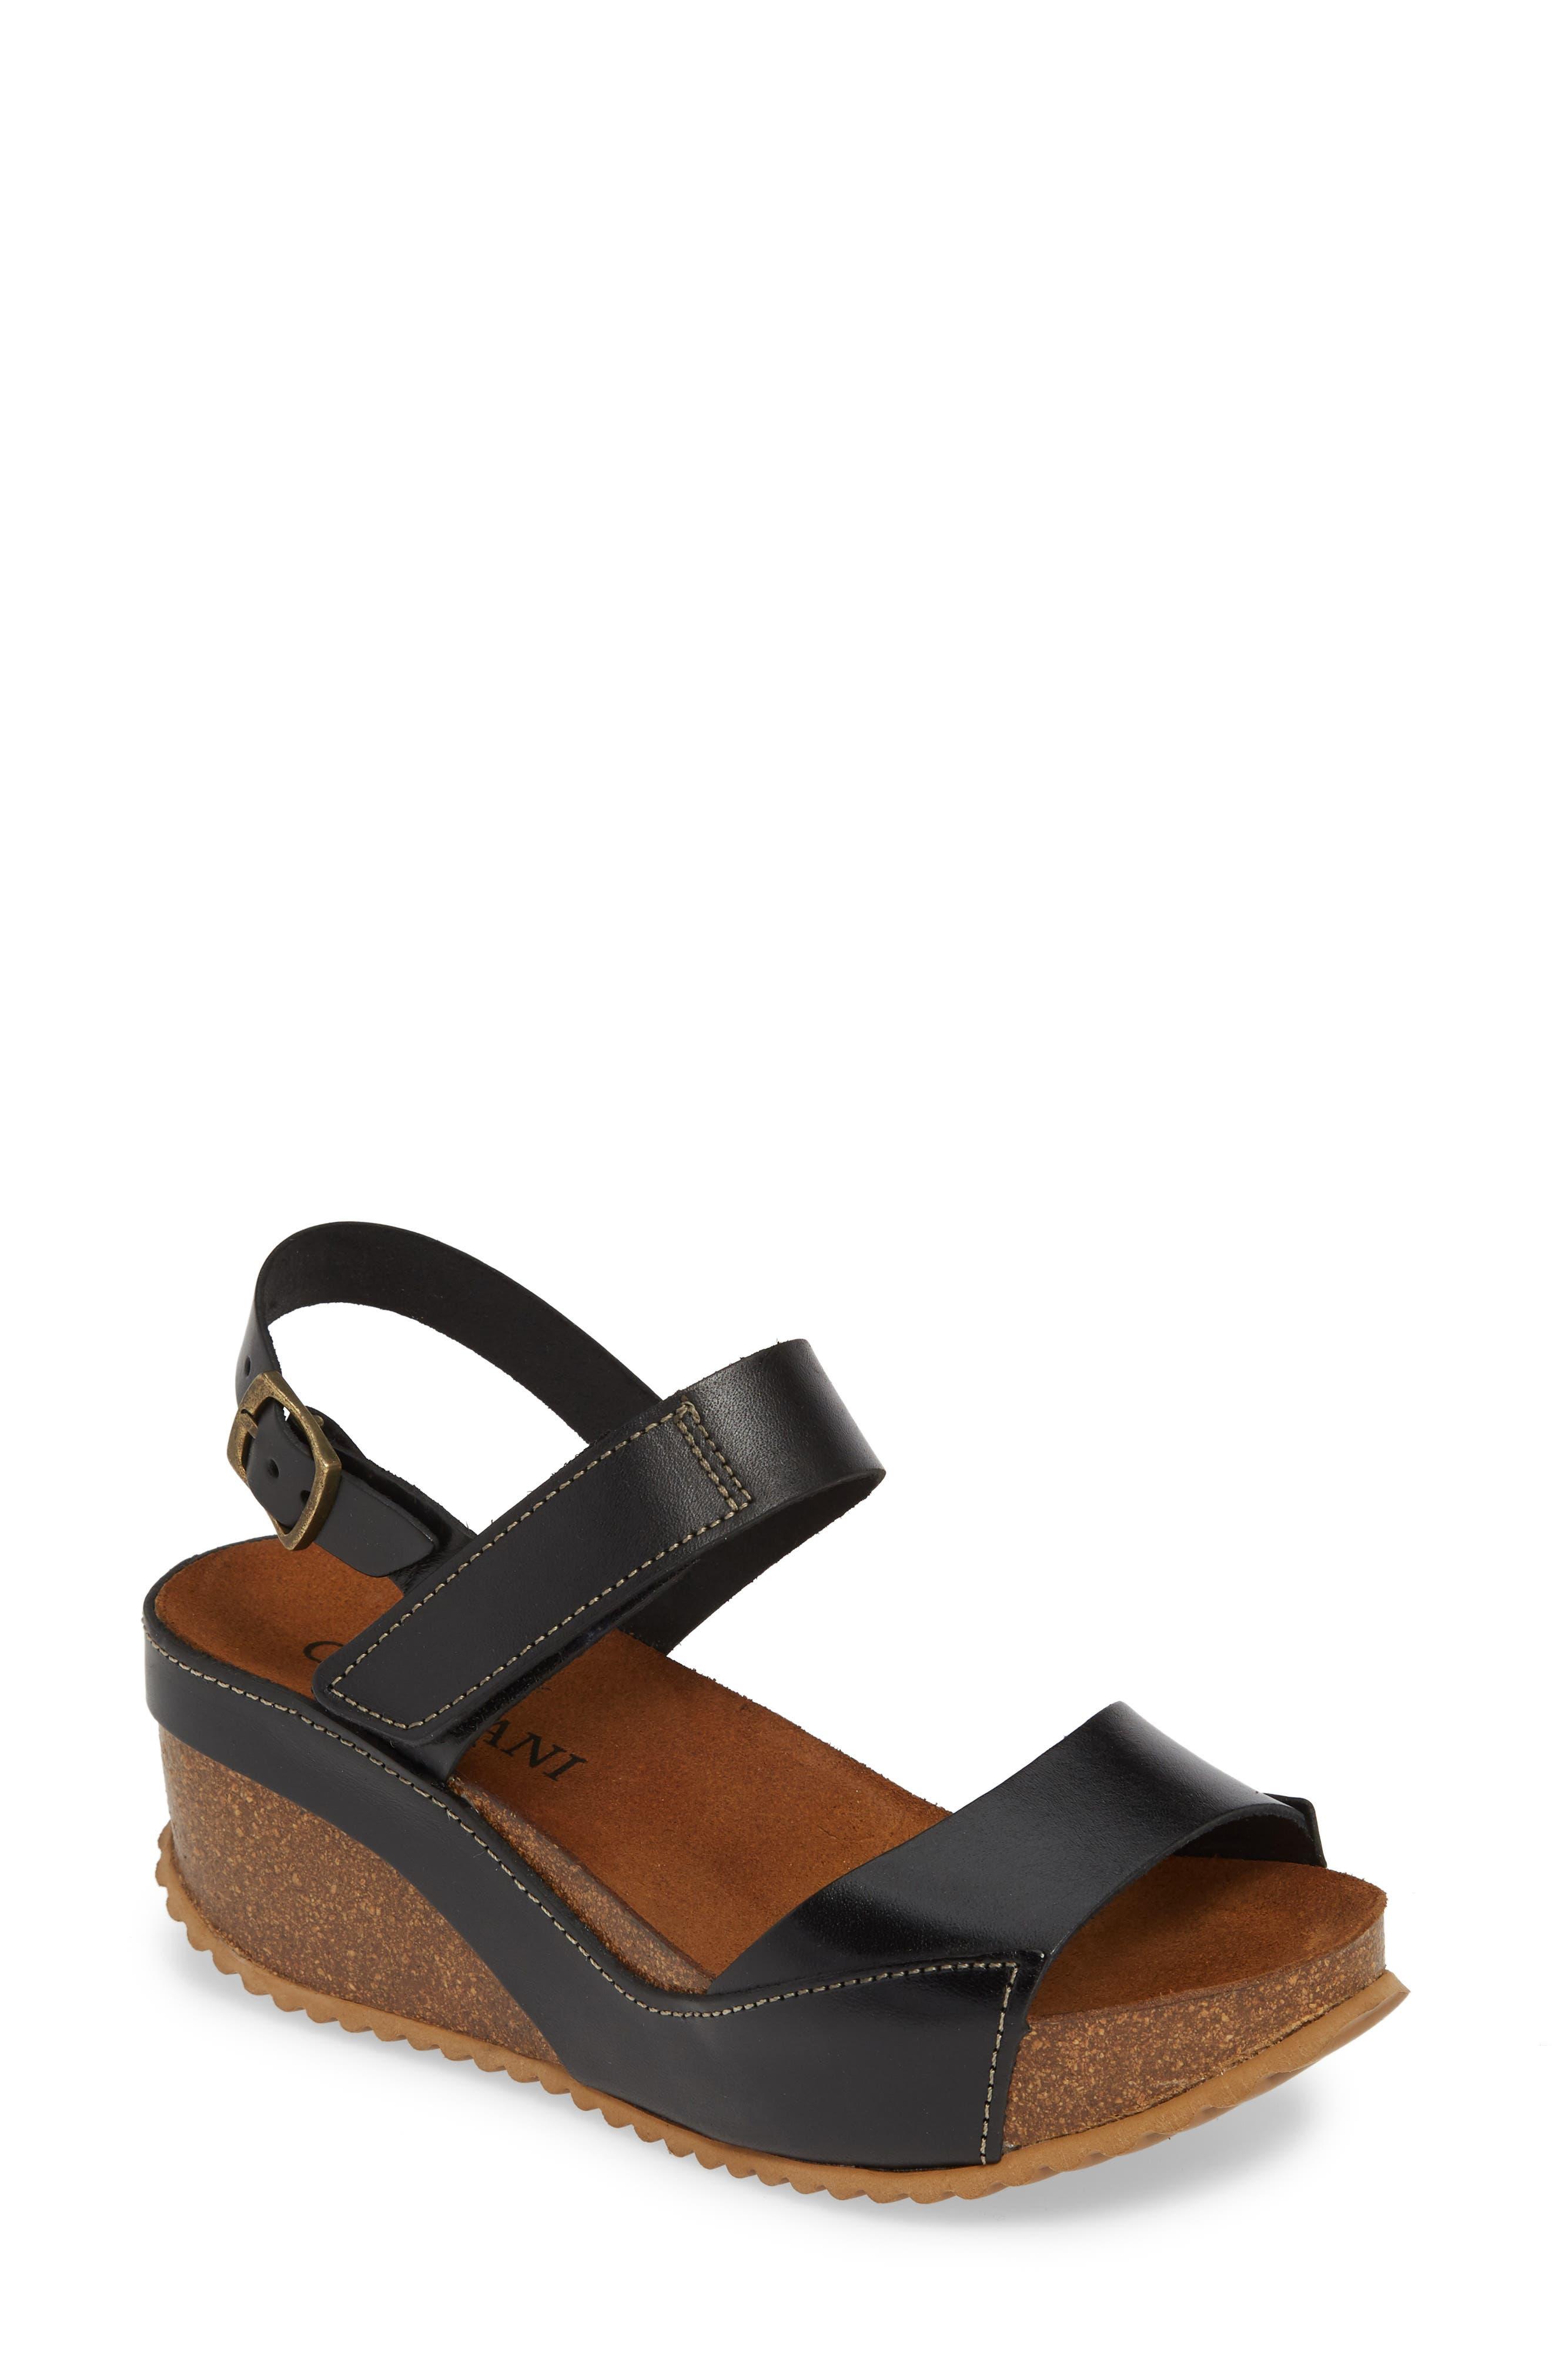 Cordani Marcelle Wedge Sandal - Black